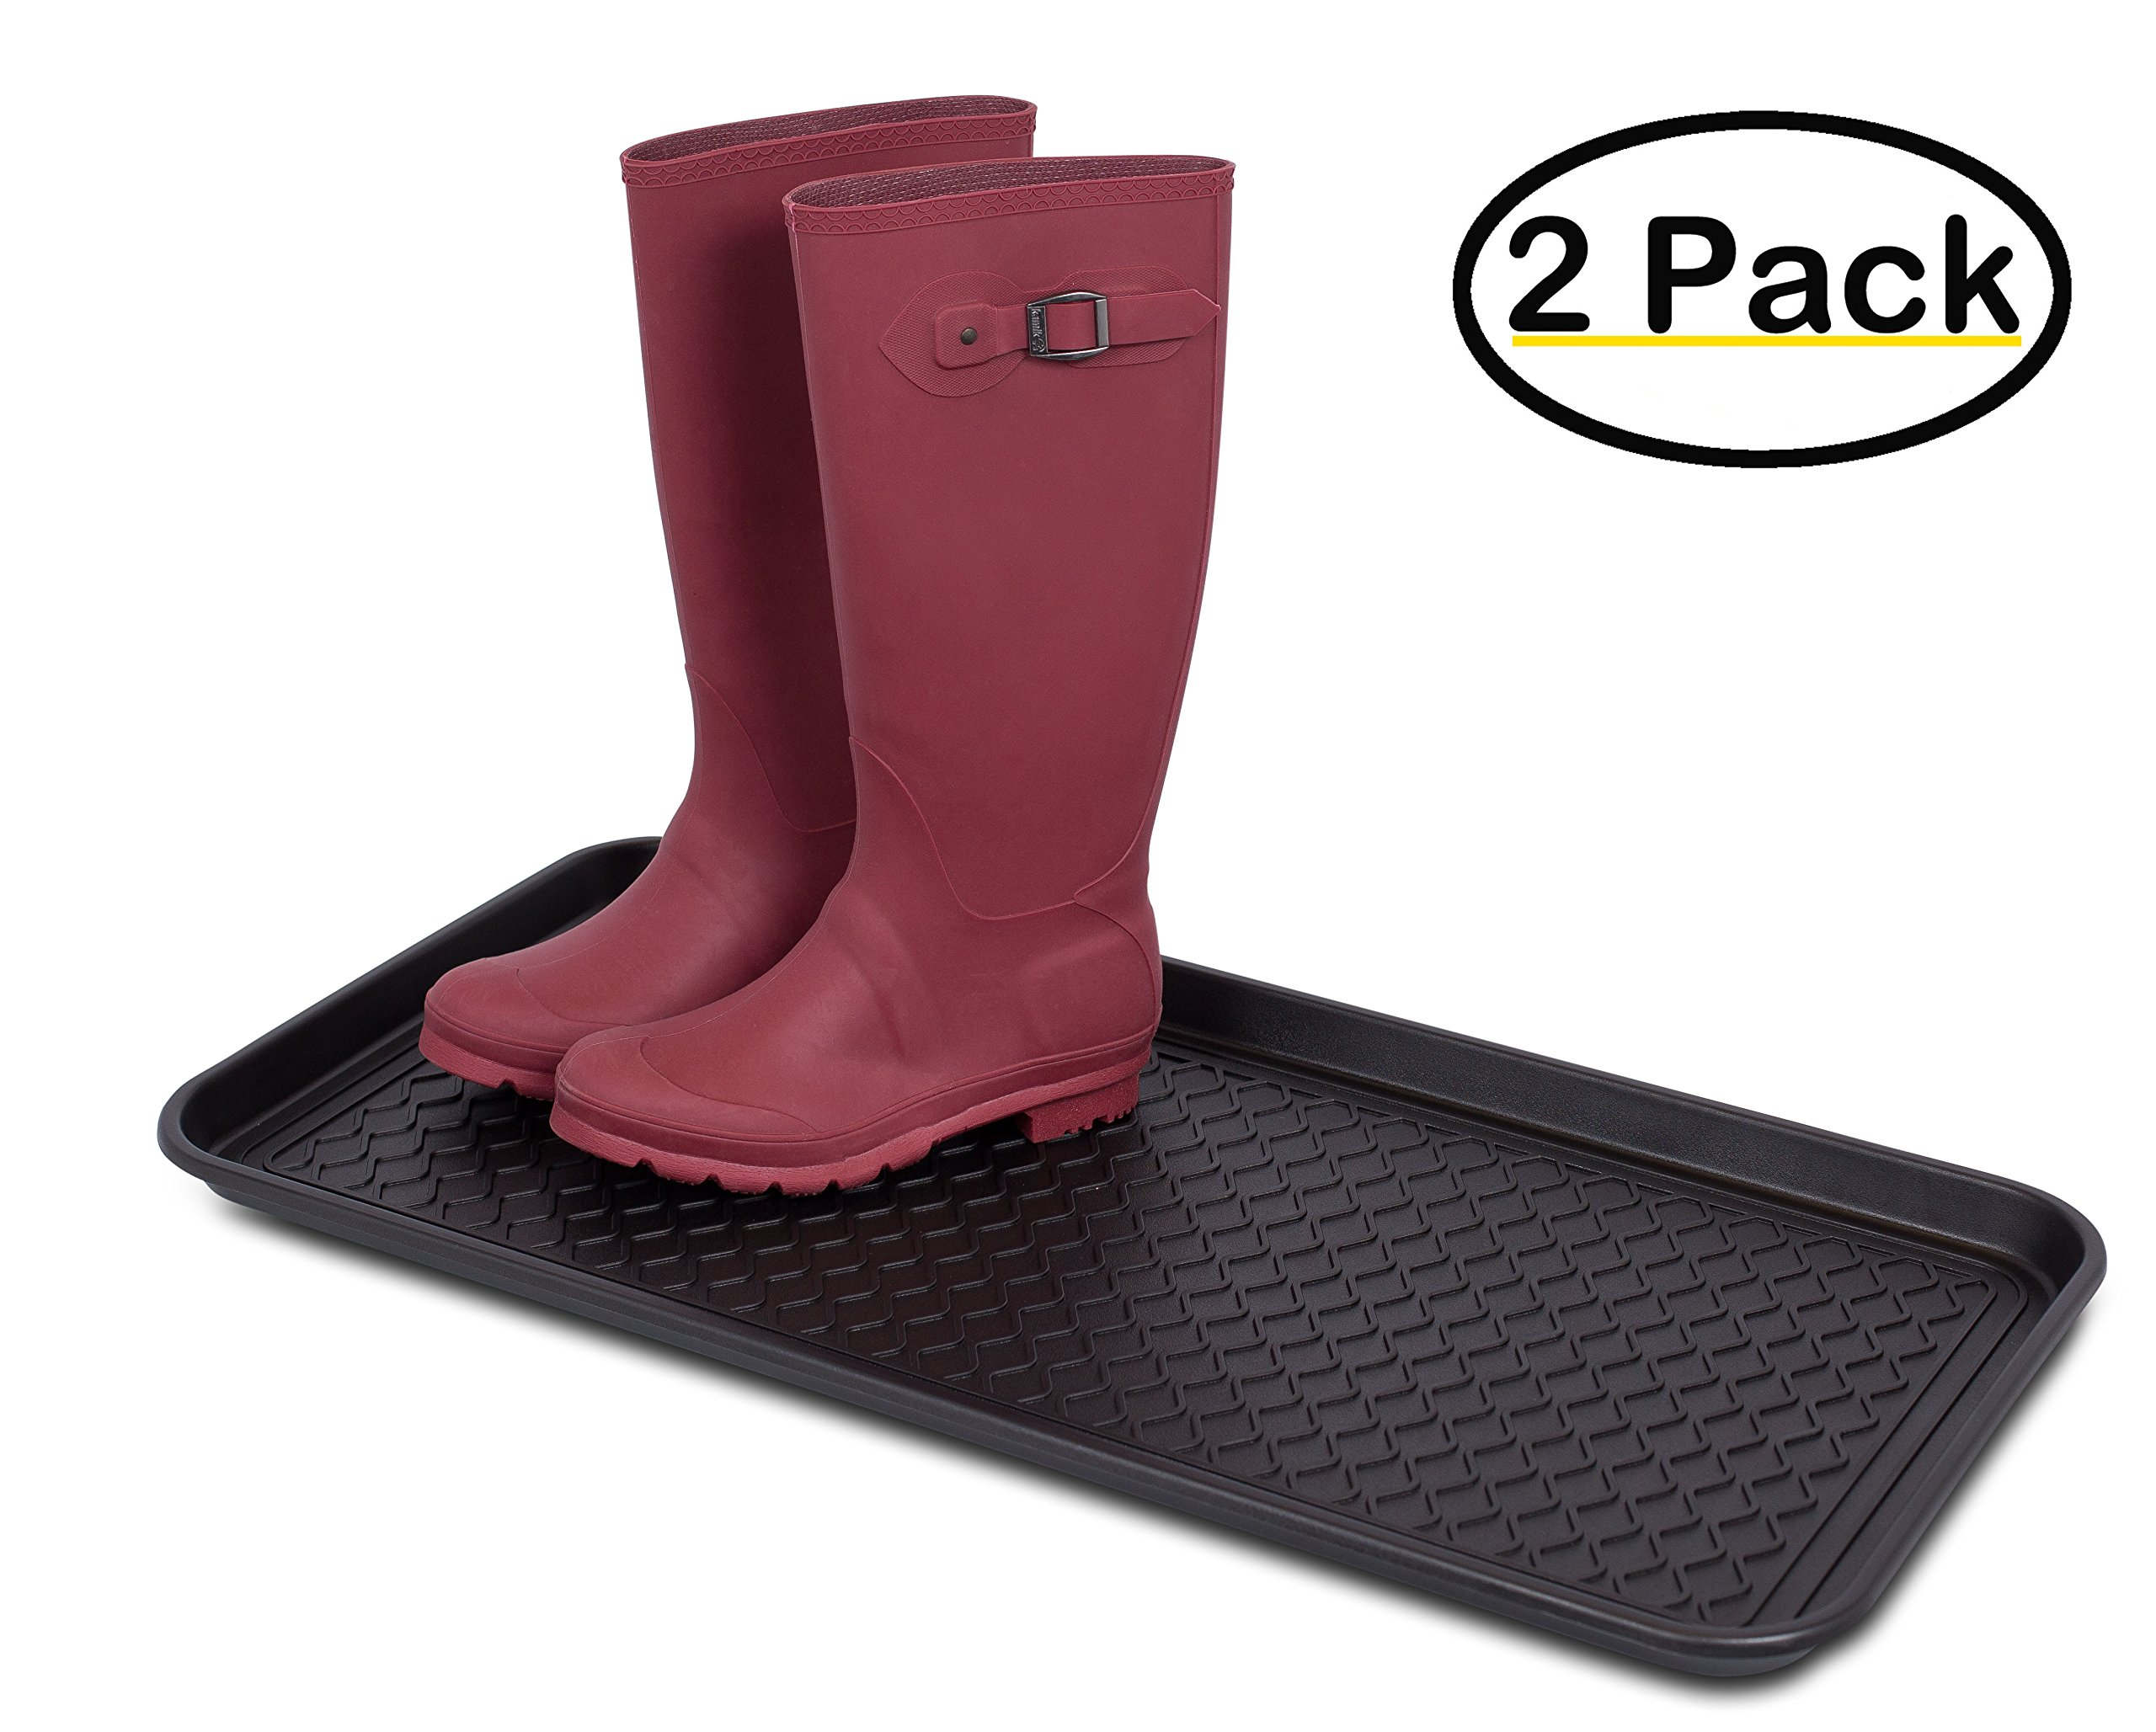 Internet's Best Waterproof Multi-Purpose Polypropylene Tray, 30-Inch-by-15-Inch, Rectangle